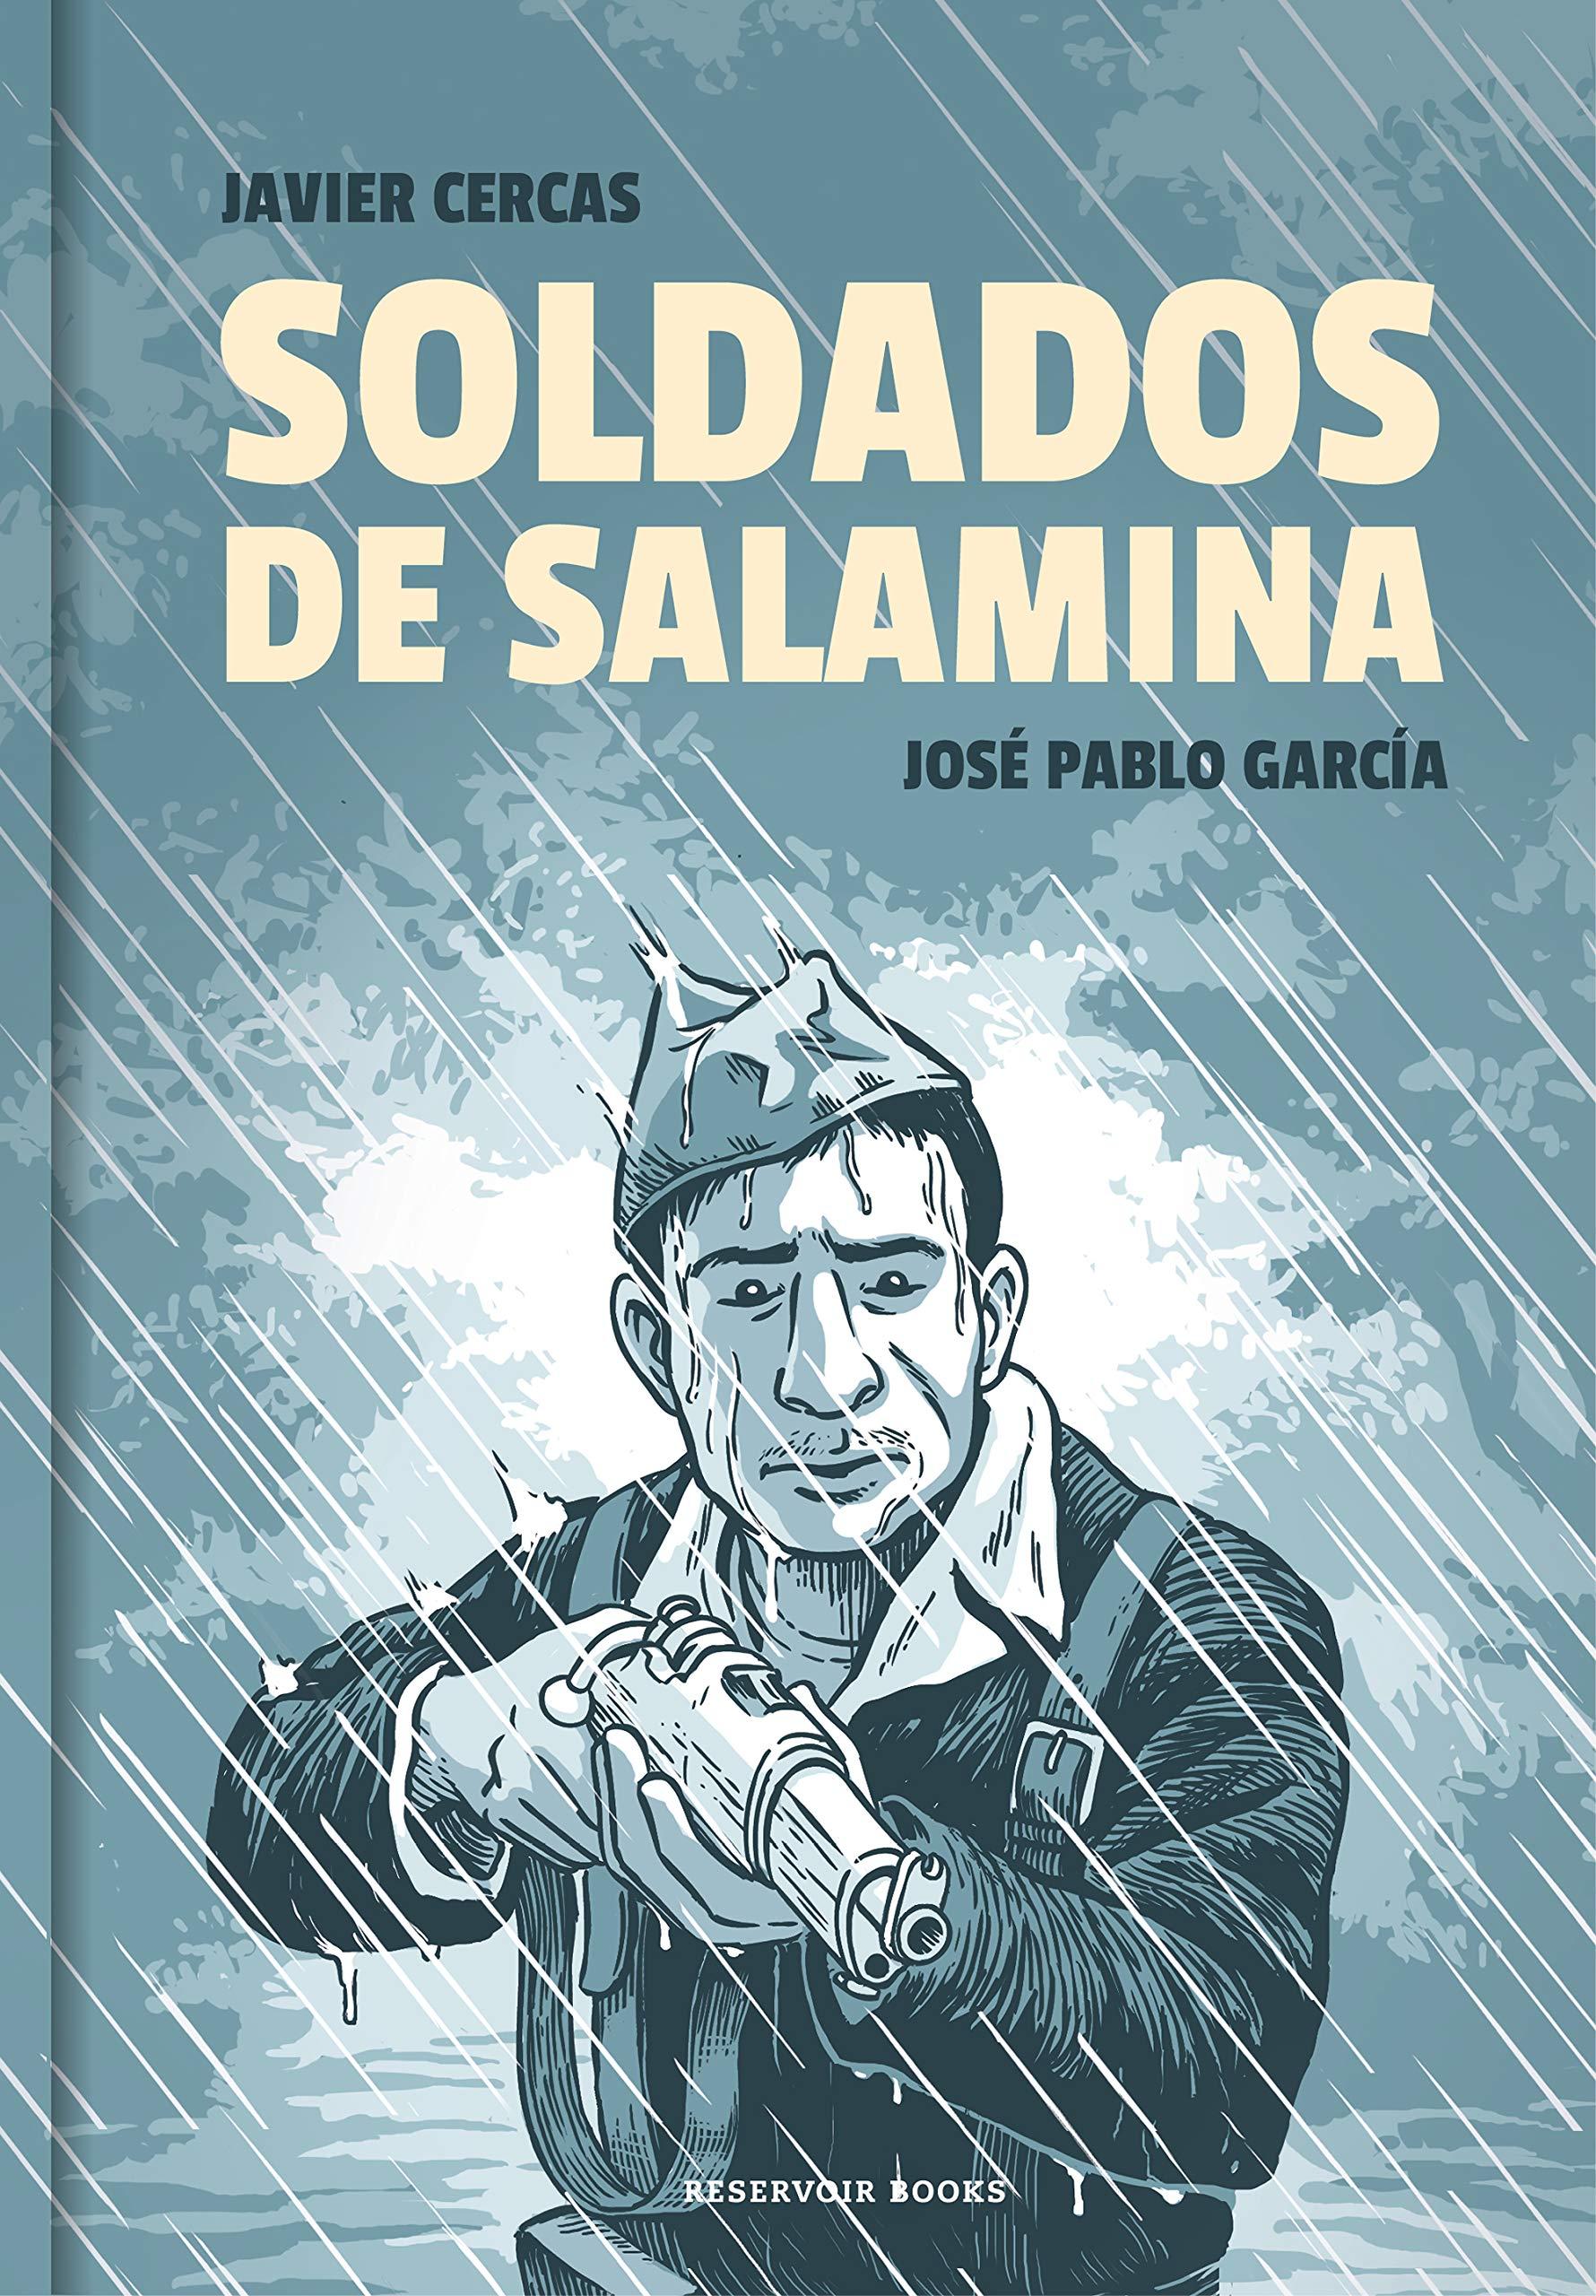 Soldados De Salamina Novela Gráfica Soldiers Of Salamis The Graphic Novel Soldados De Salamina Soldiers Of Salamis Amazon Co Uk Cercas Javier 9788417511517 Books